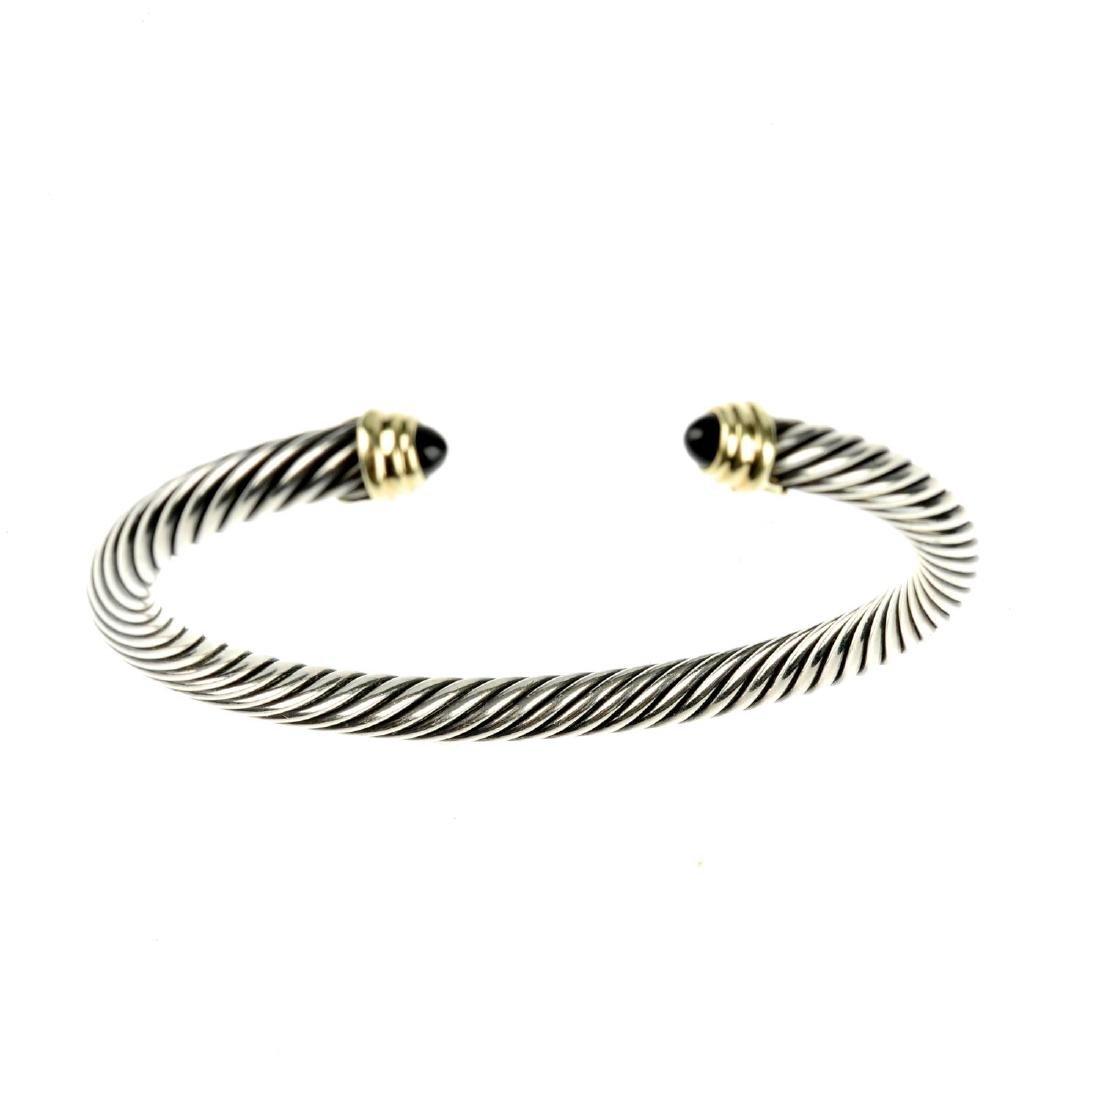 DAVID YURMAN - a gem-set bangle. A torque style bangle